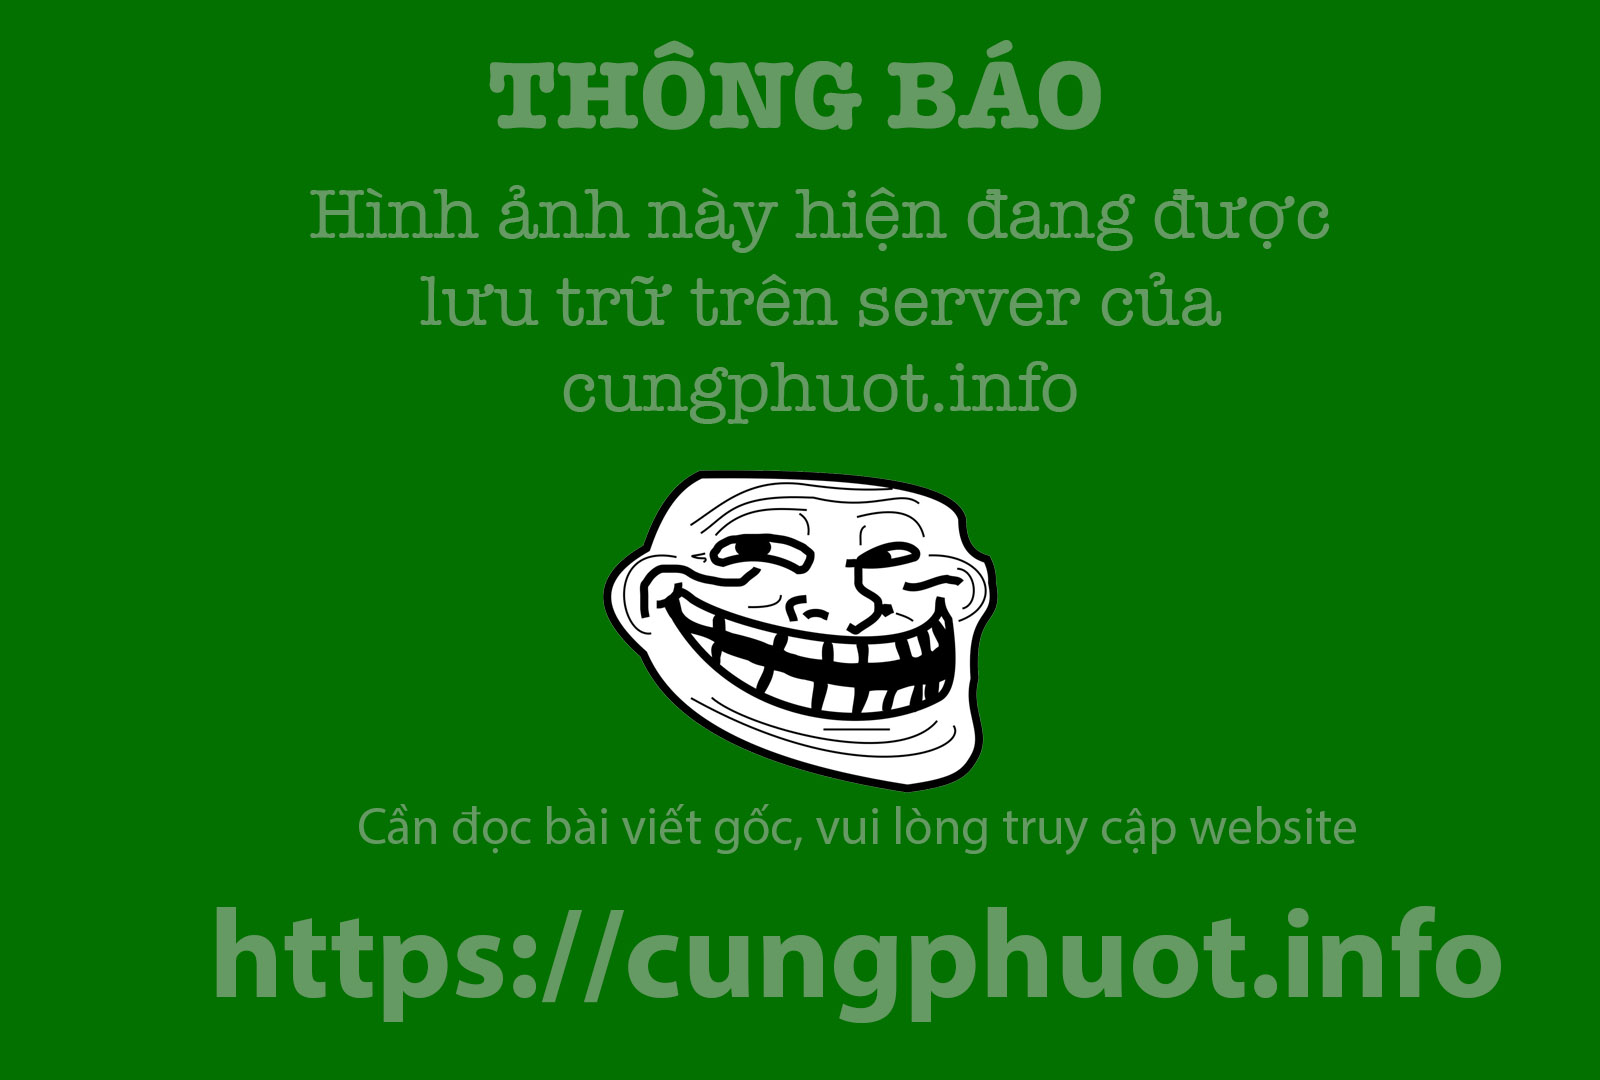 Co do Lam Kinh nhin tu tren cao hinh anh 5